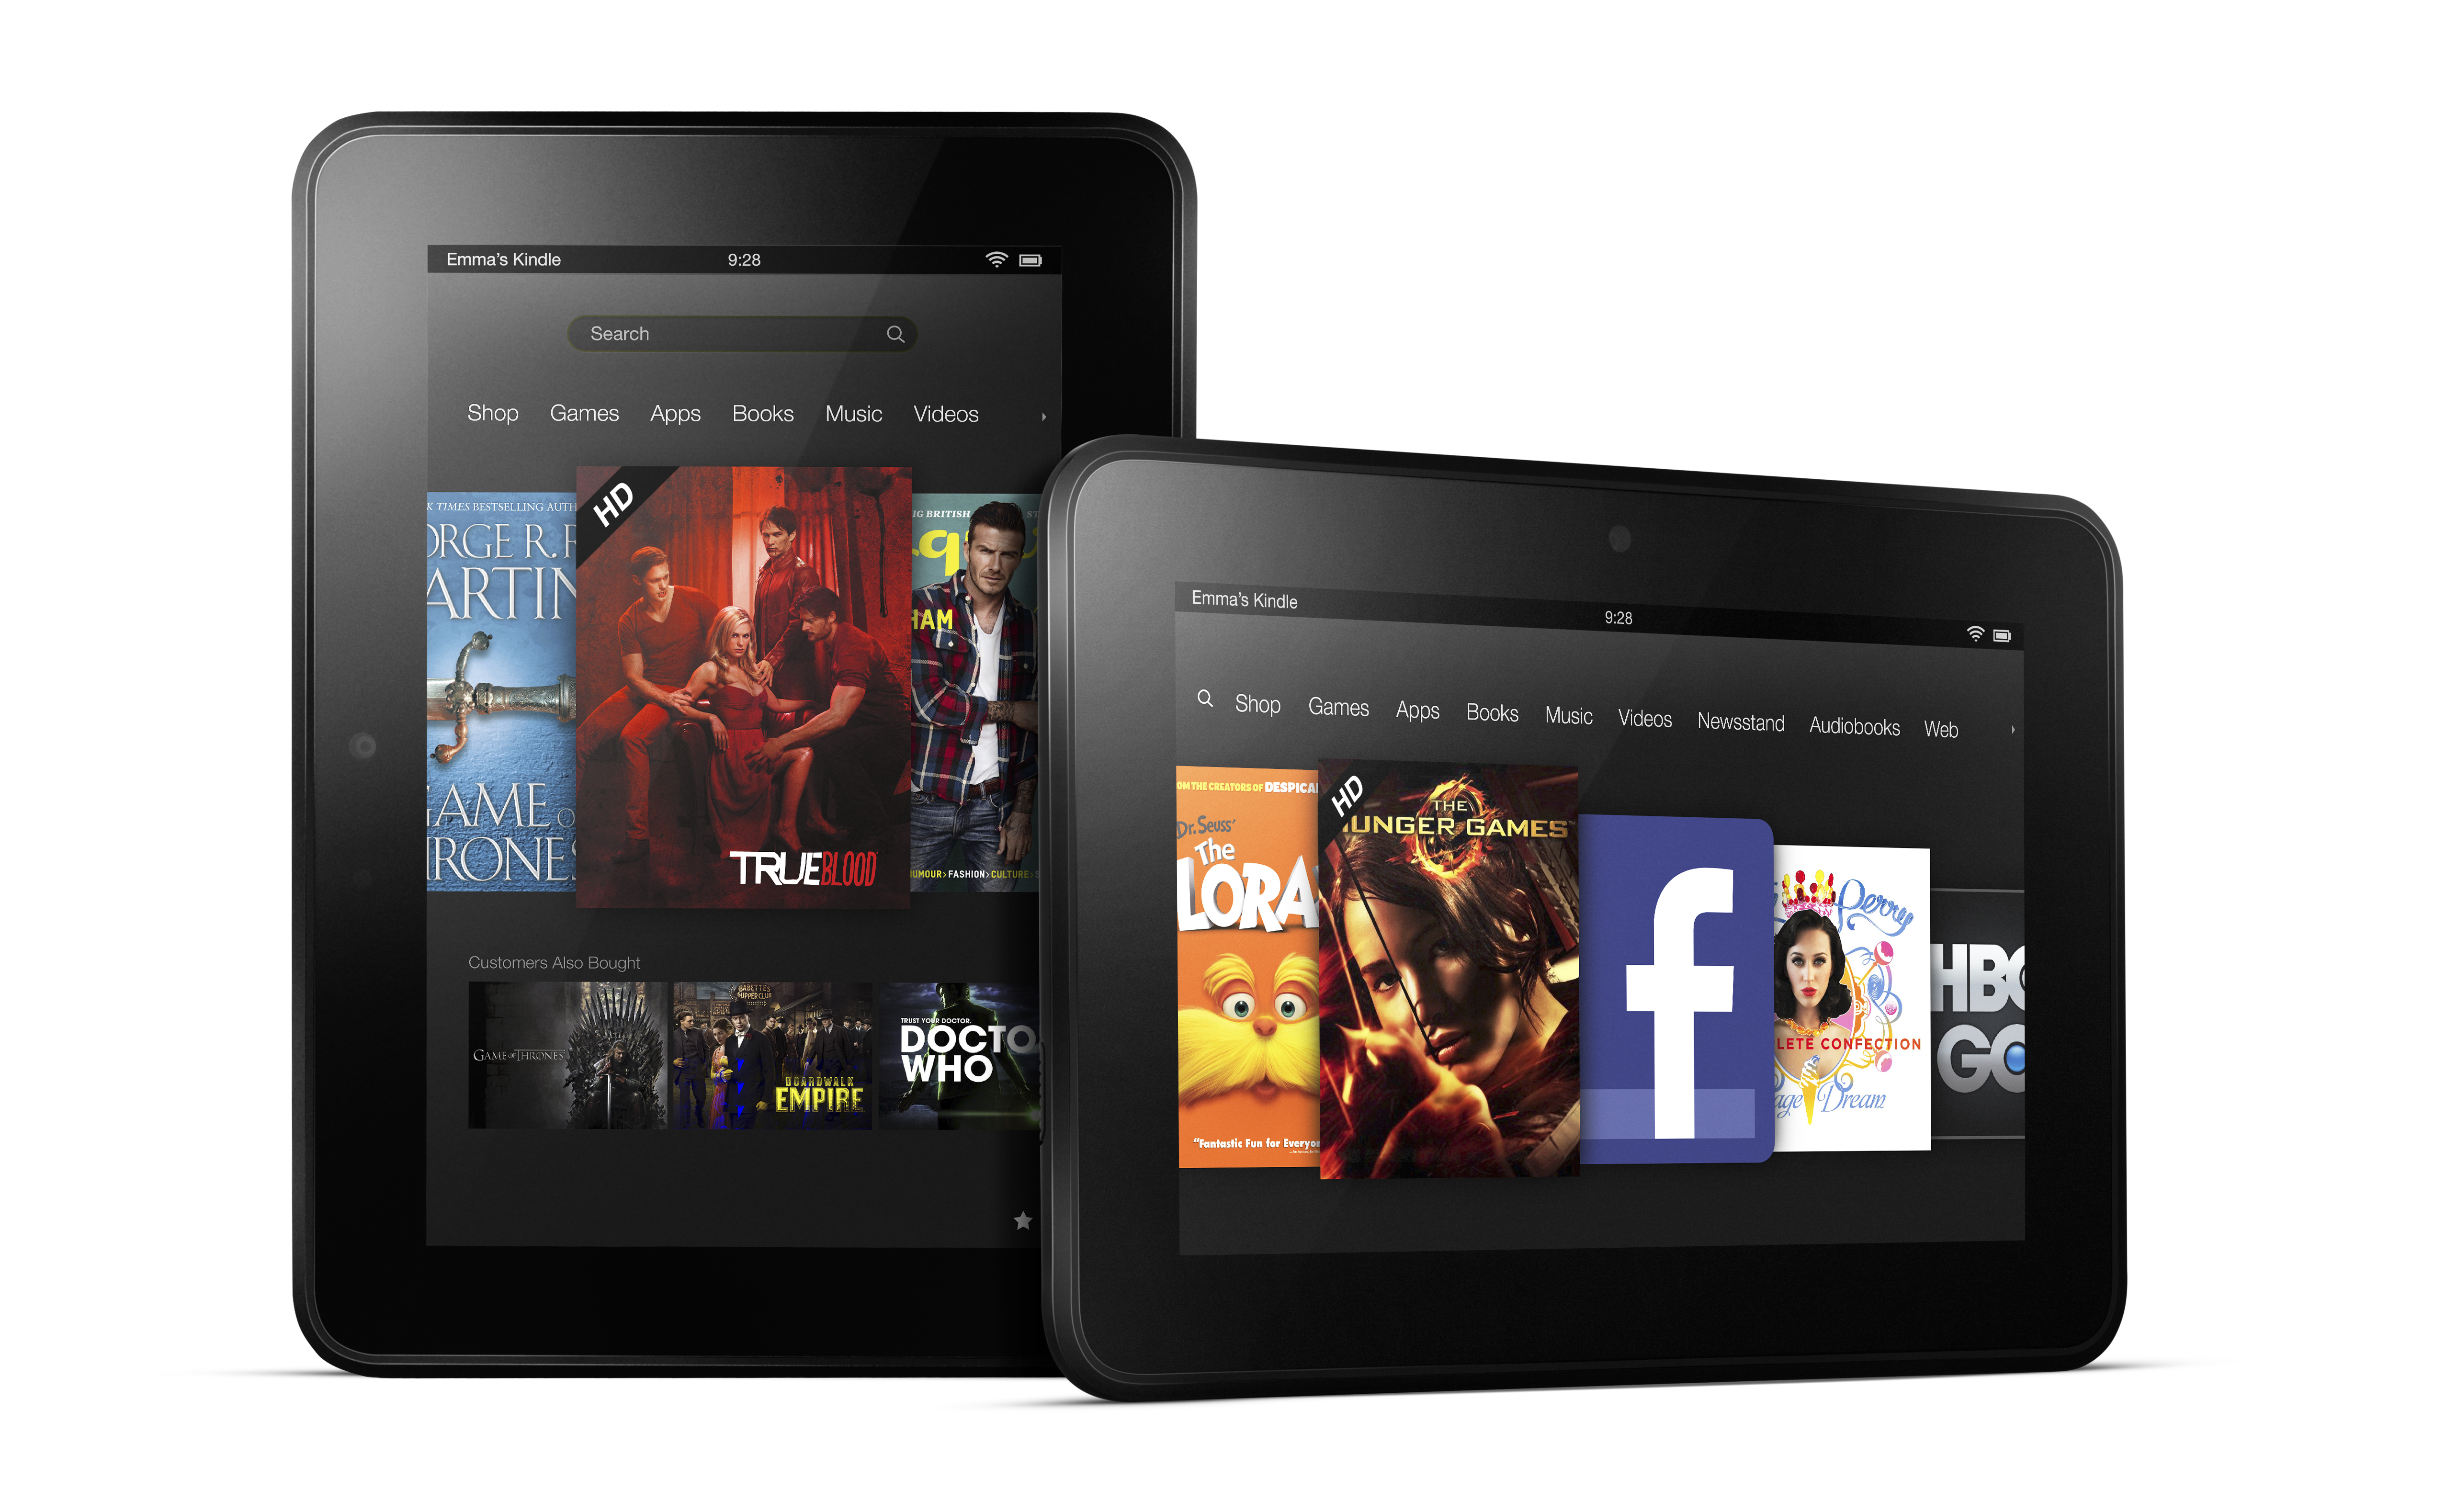 gigaom amazon pushes forward with kindle fire hd s international rh gigaom com amazon kindle fire hd 10 manual Amazon Kindle Fire HD 8